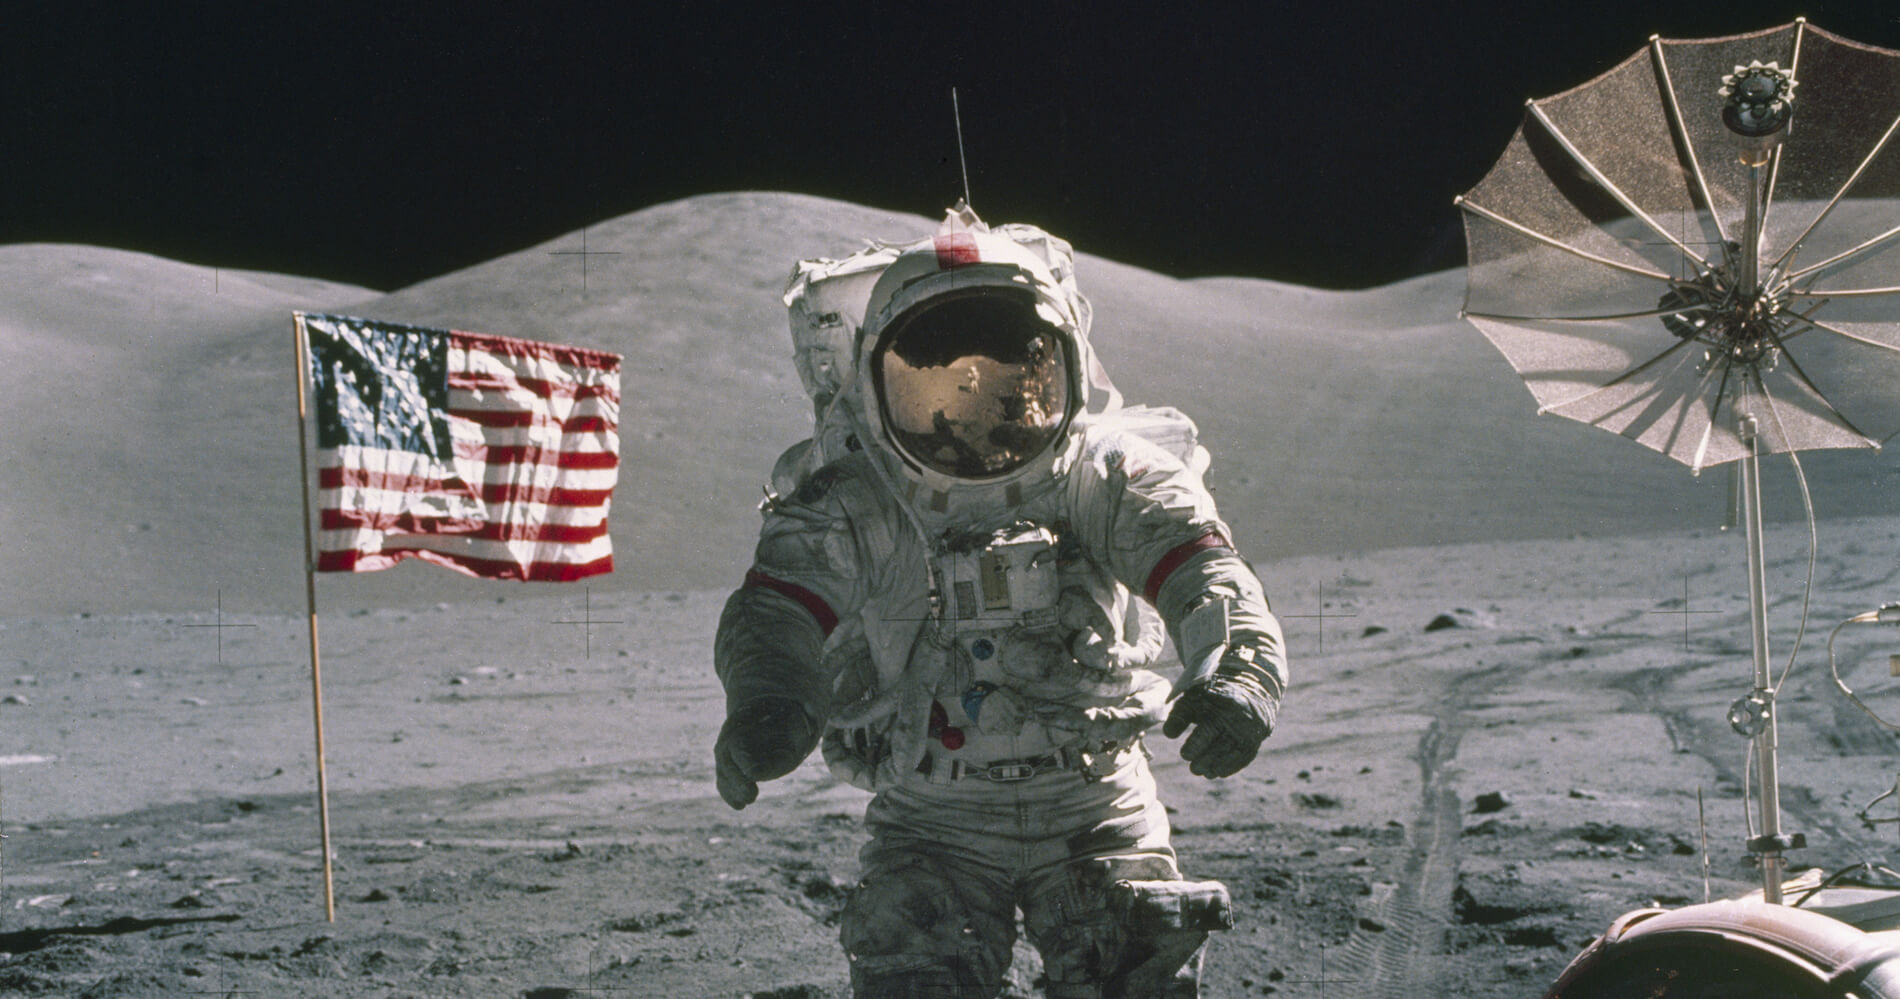 Apollo Program, NASA, Cost to go to Moon